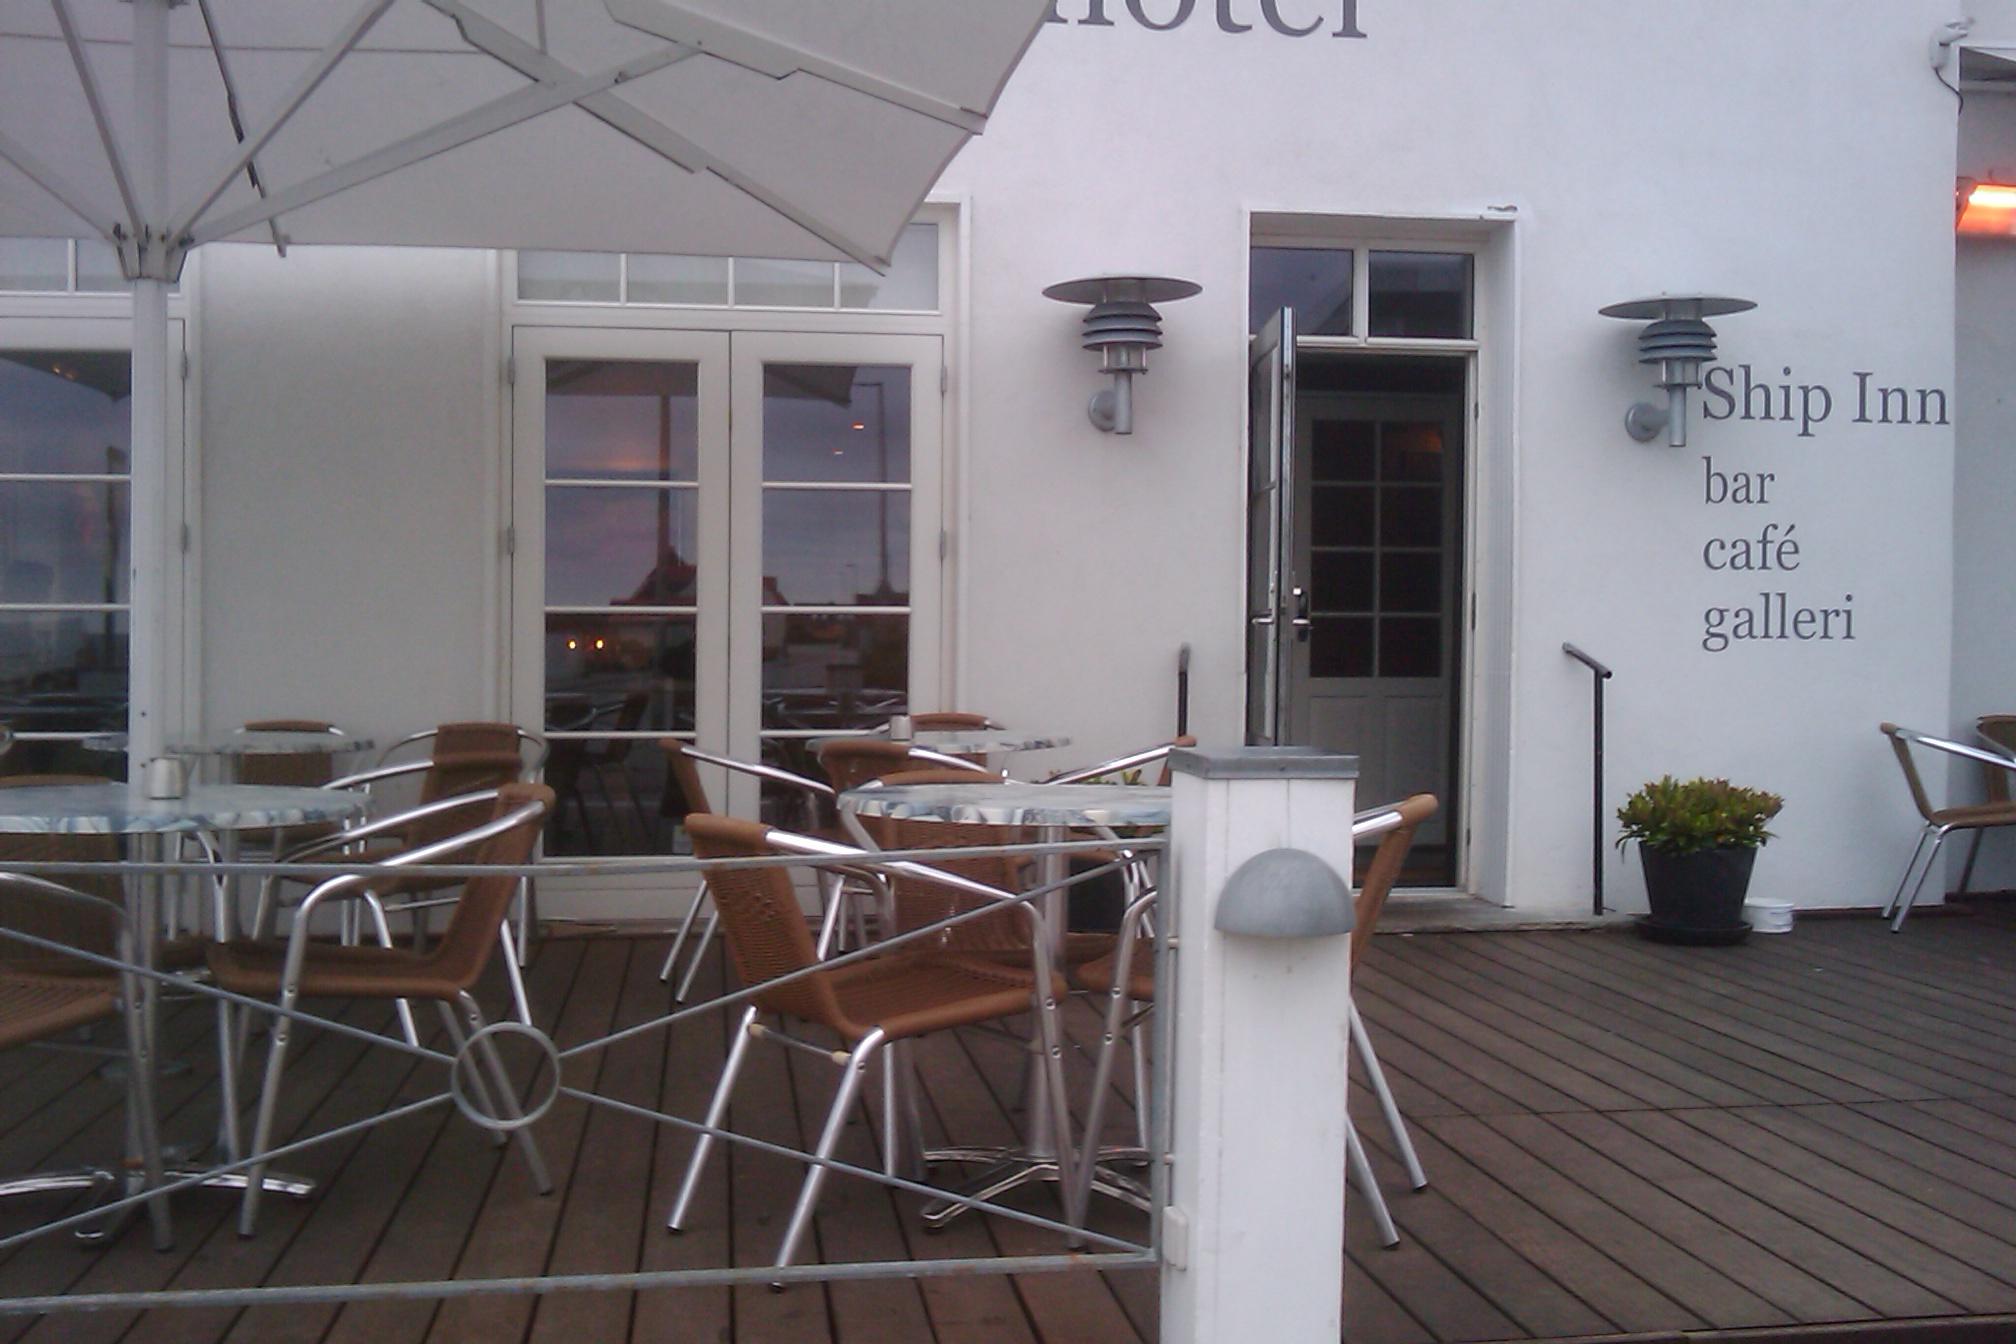 Ship-Inn Pub & Cafe